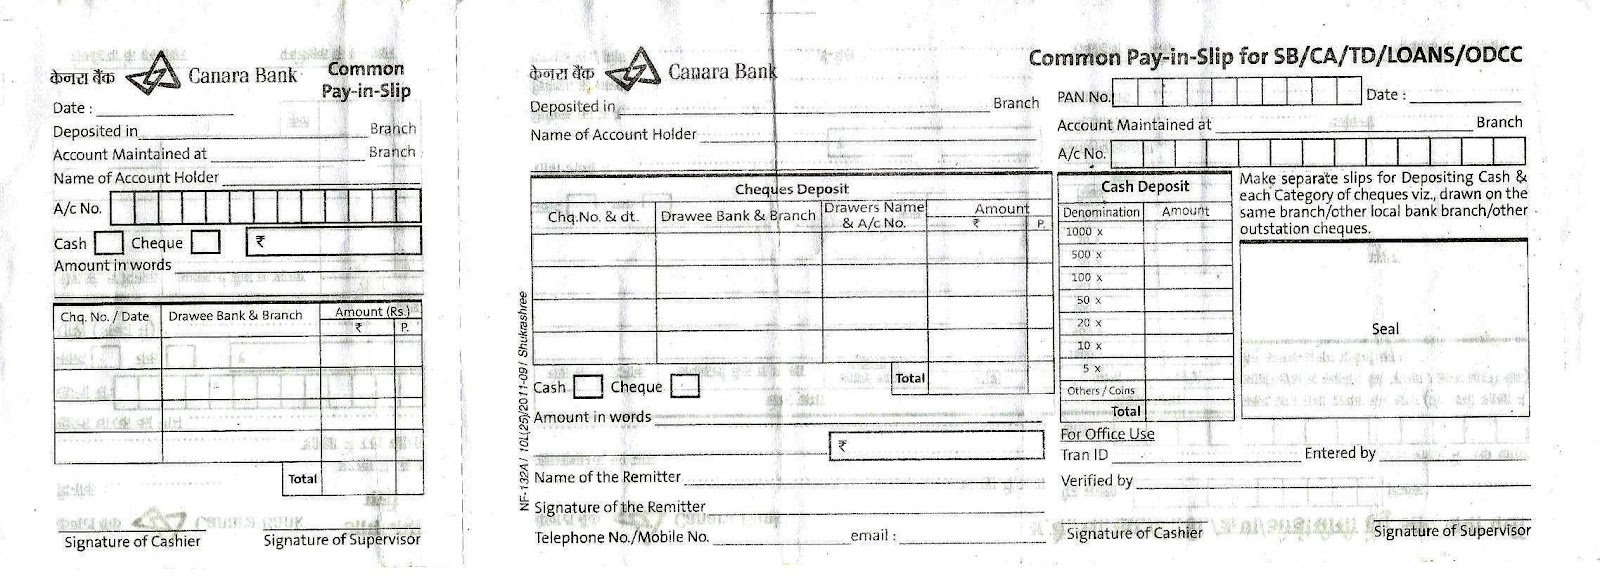 Construction Loan Advance Request Form Image 5